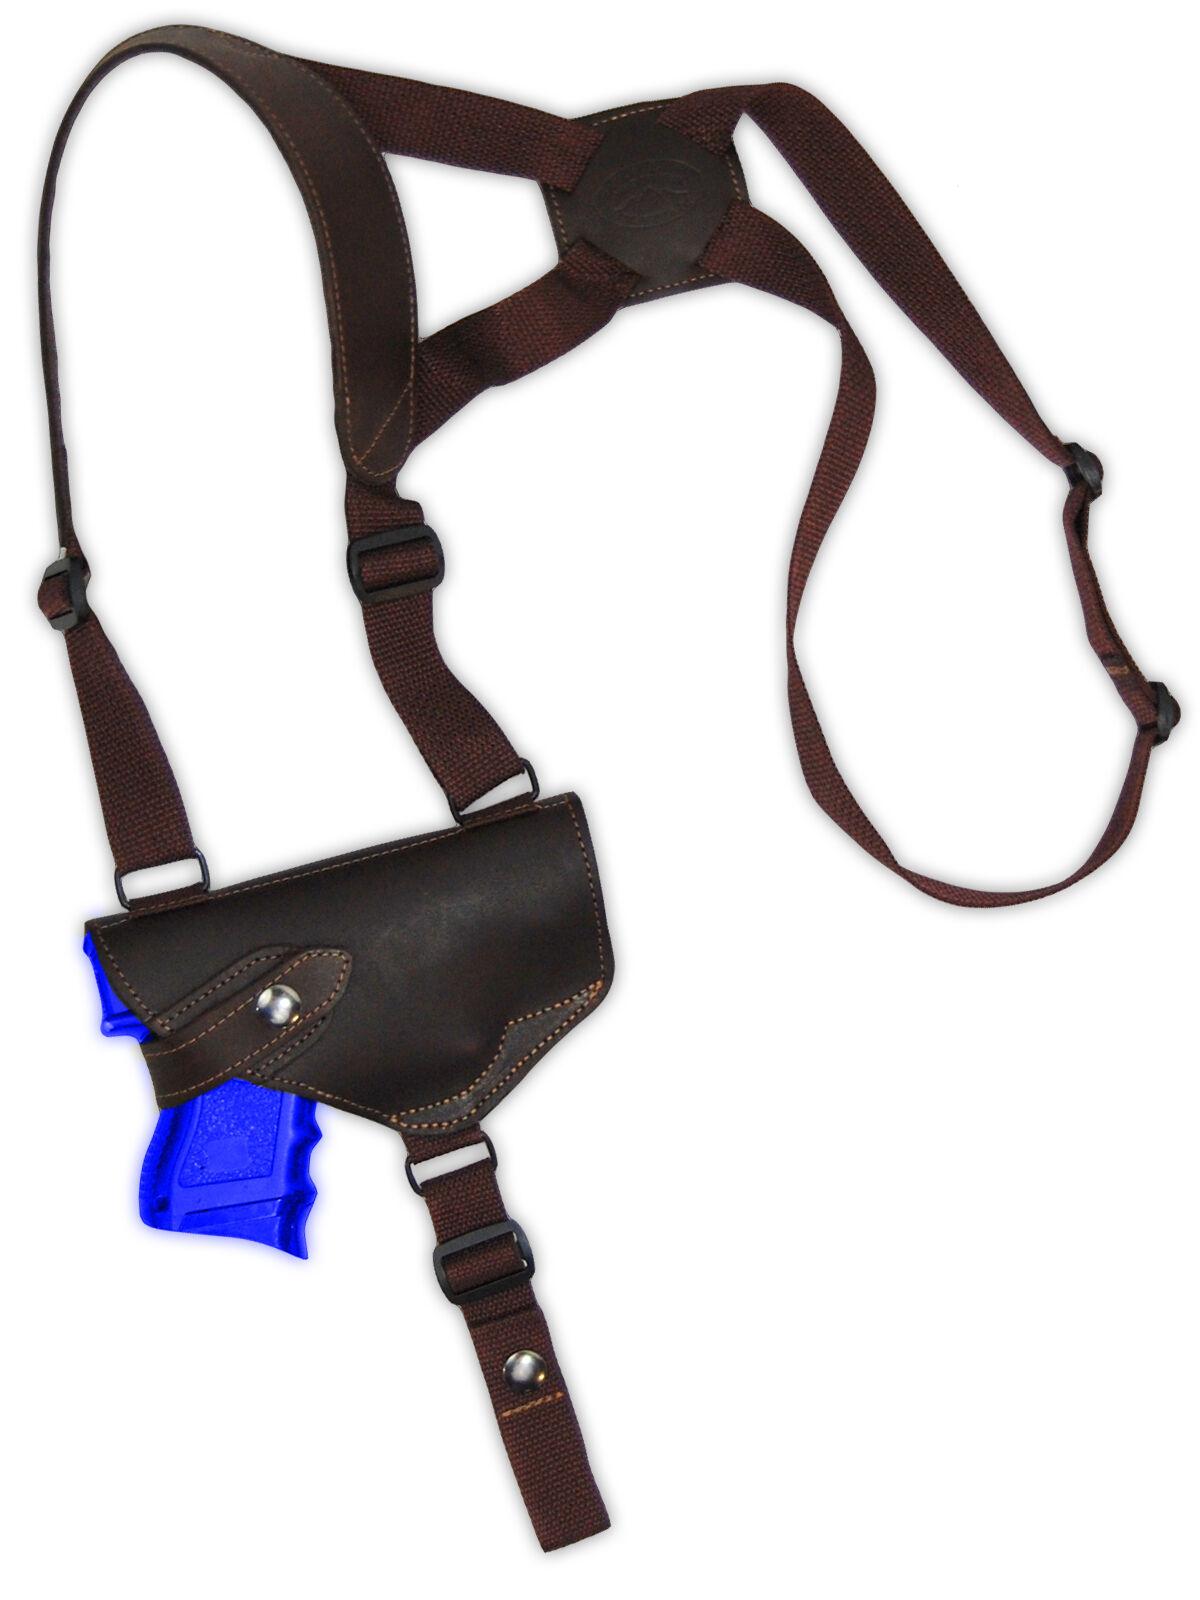 NEW Barsony Horizontal Braun Leder Shoulder Holster Springfield Comp 9mm 40 45